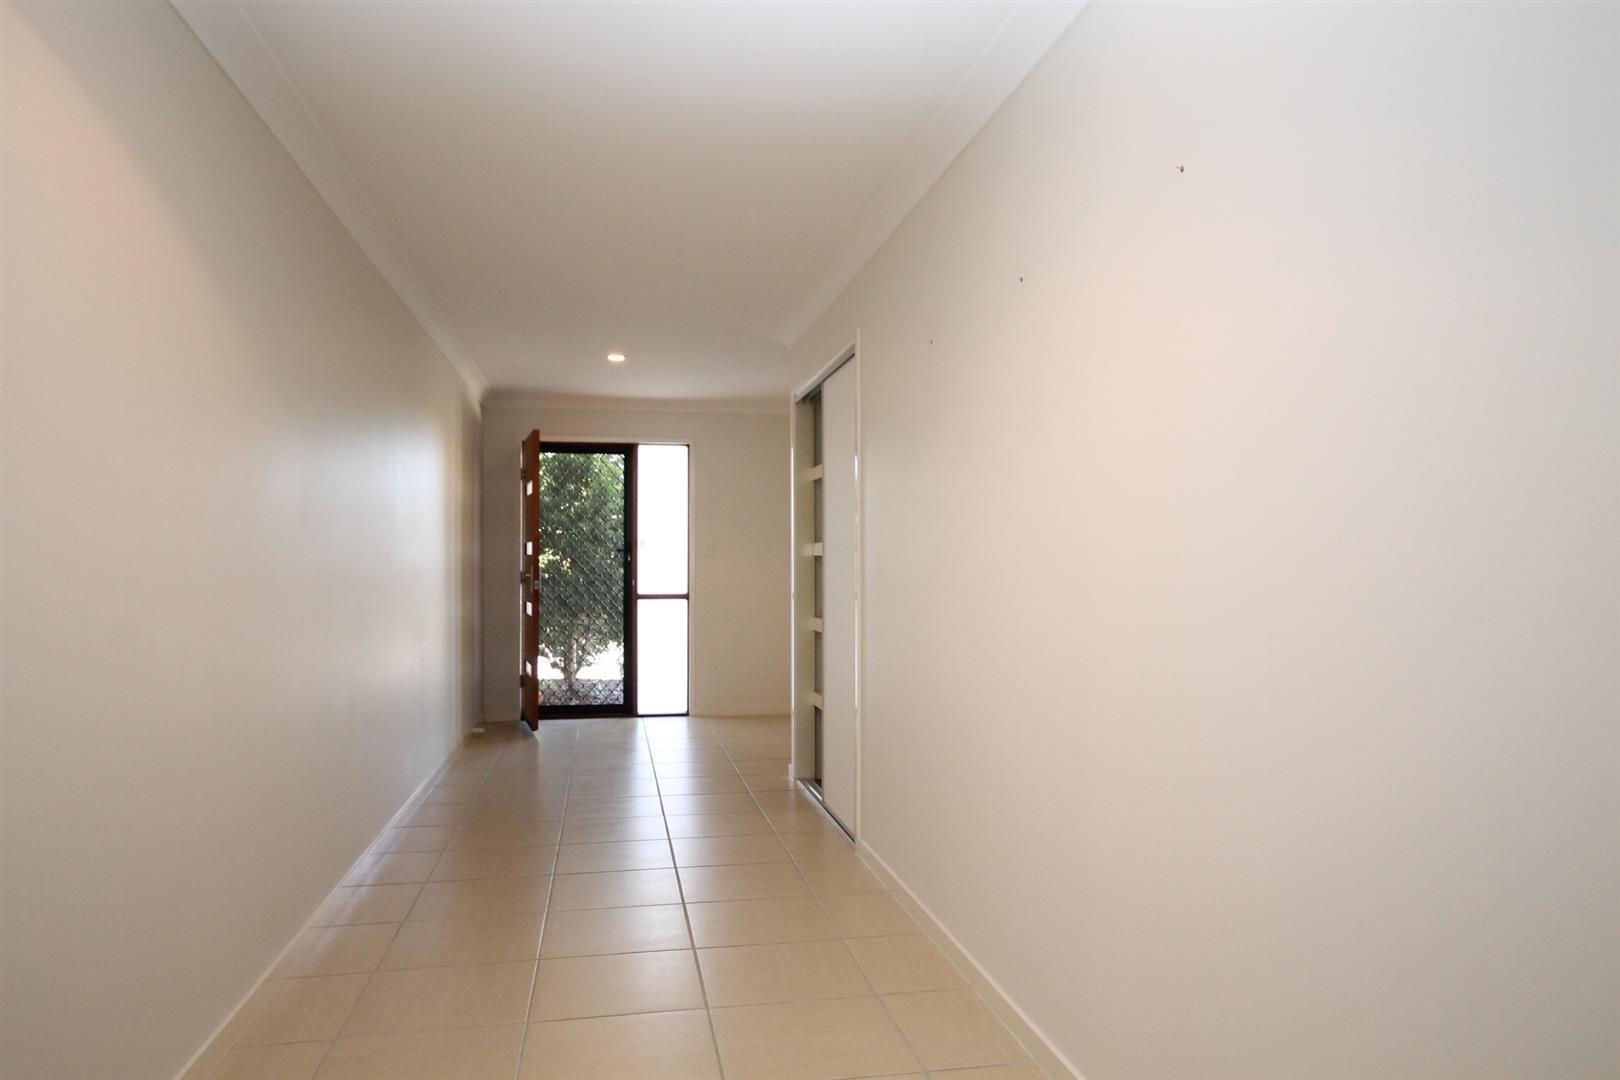 2/19 Conestoga Way, Upper Coomera QLD 4209, Image 1